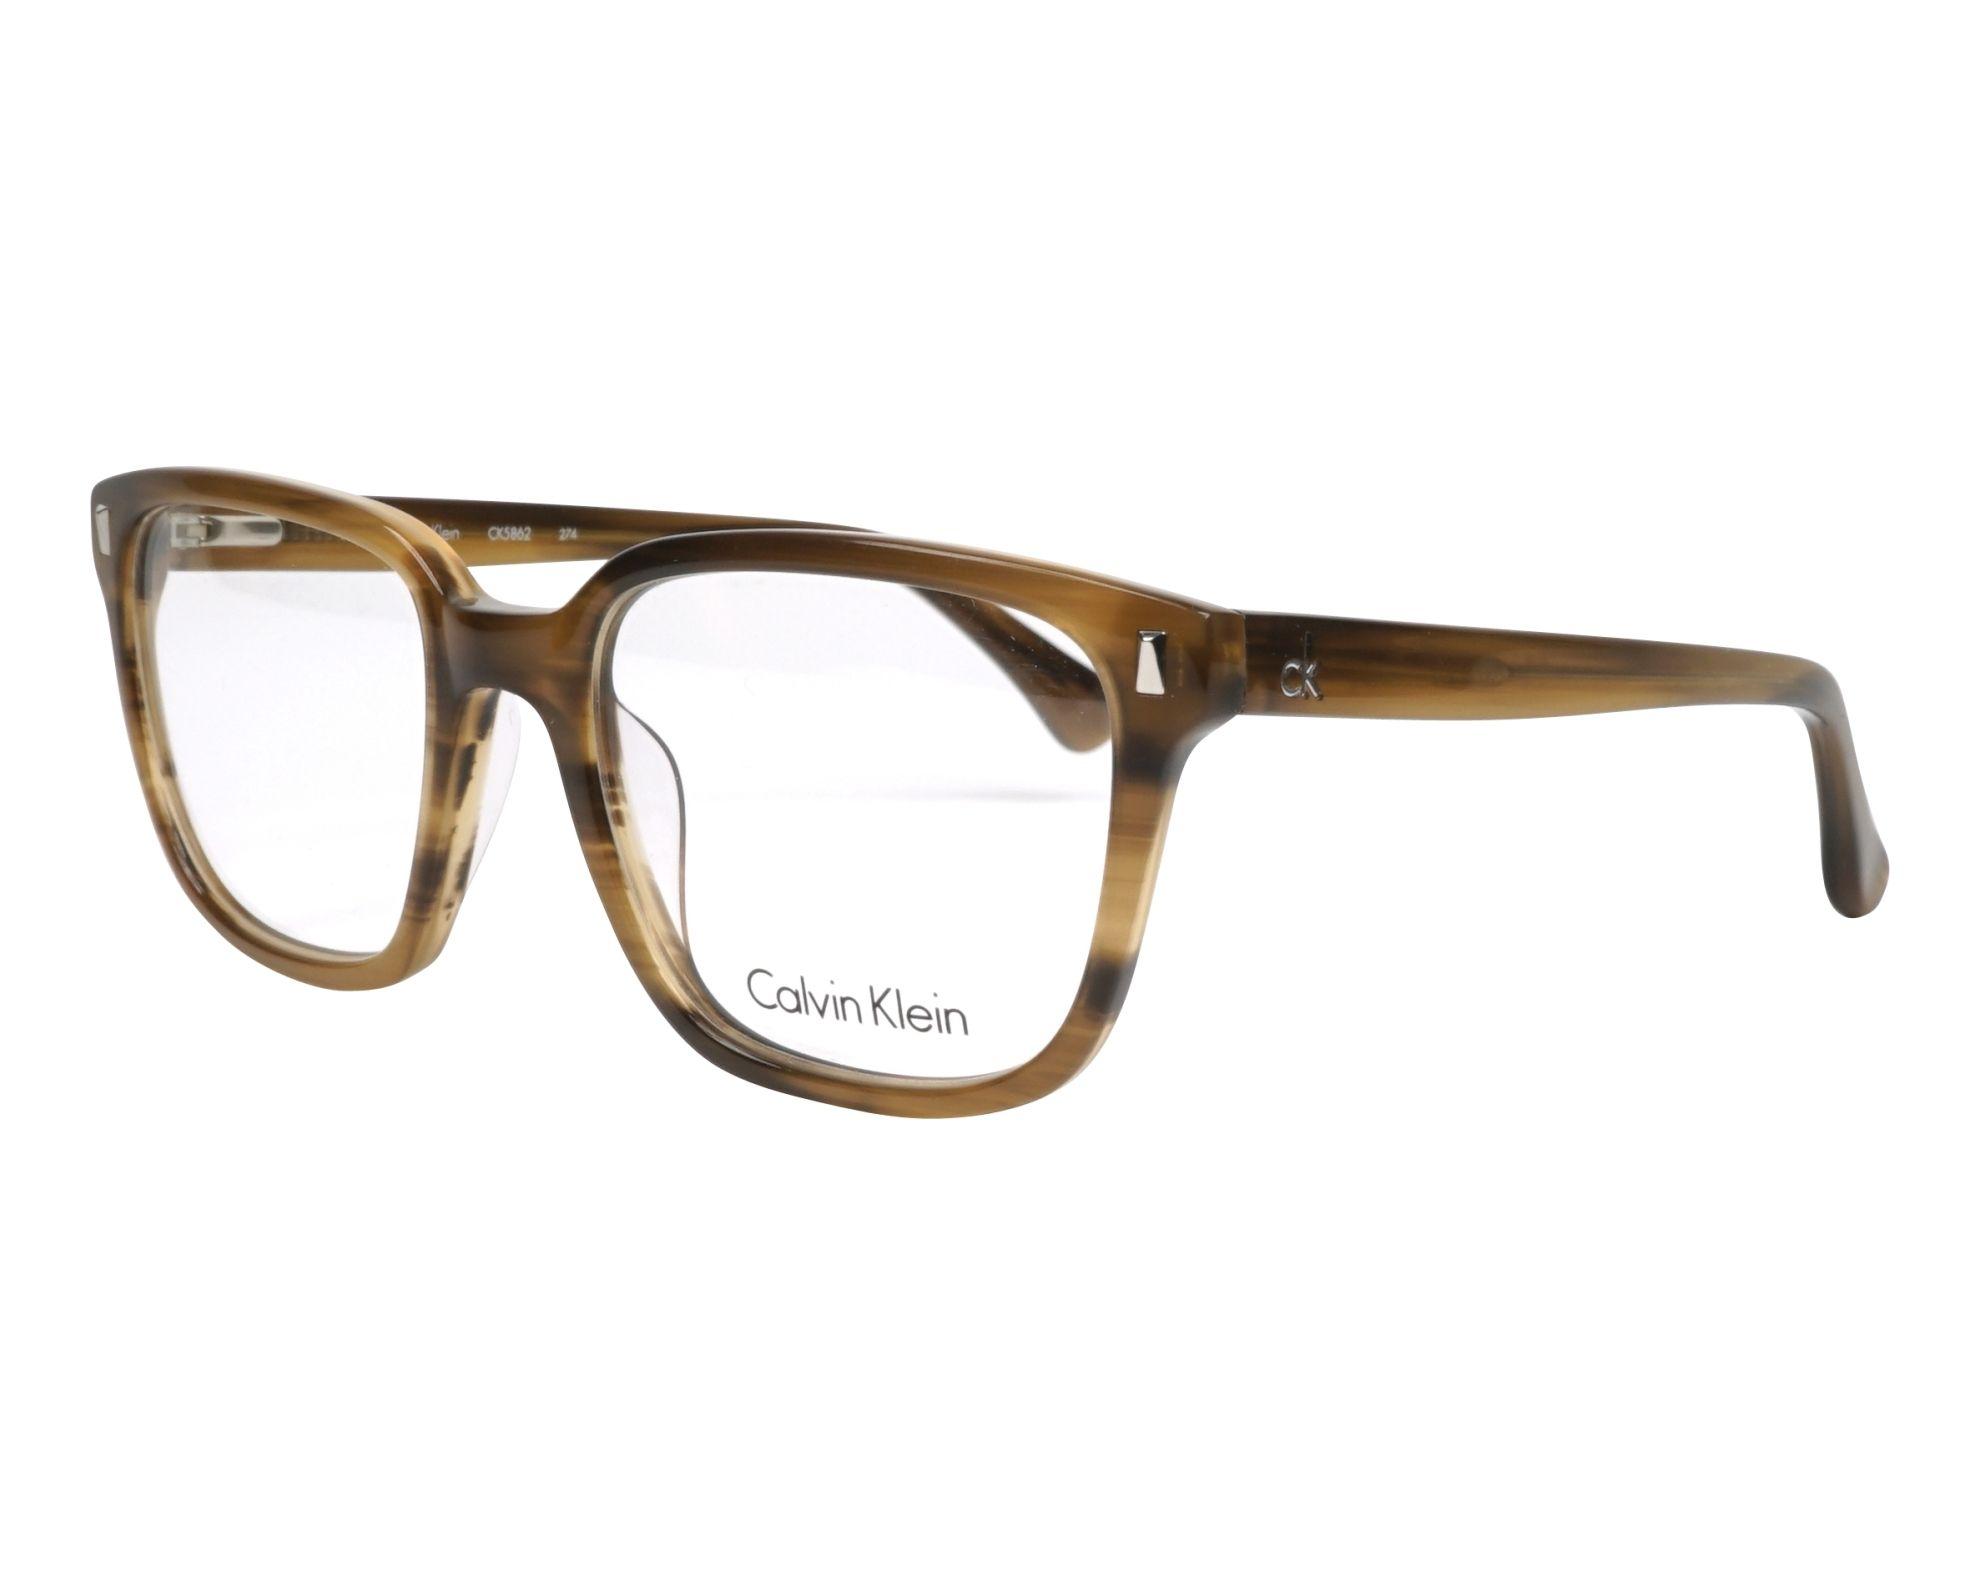 d55ded8bde Gafas Graduadas Calvin Klein CK-5862 274 52-19 Marrón Marrón vista de perfil